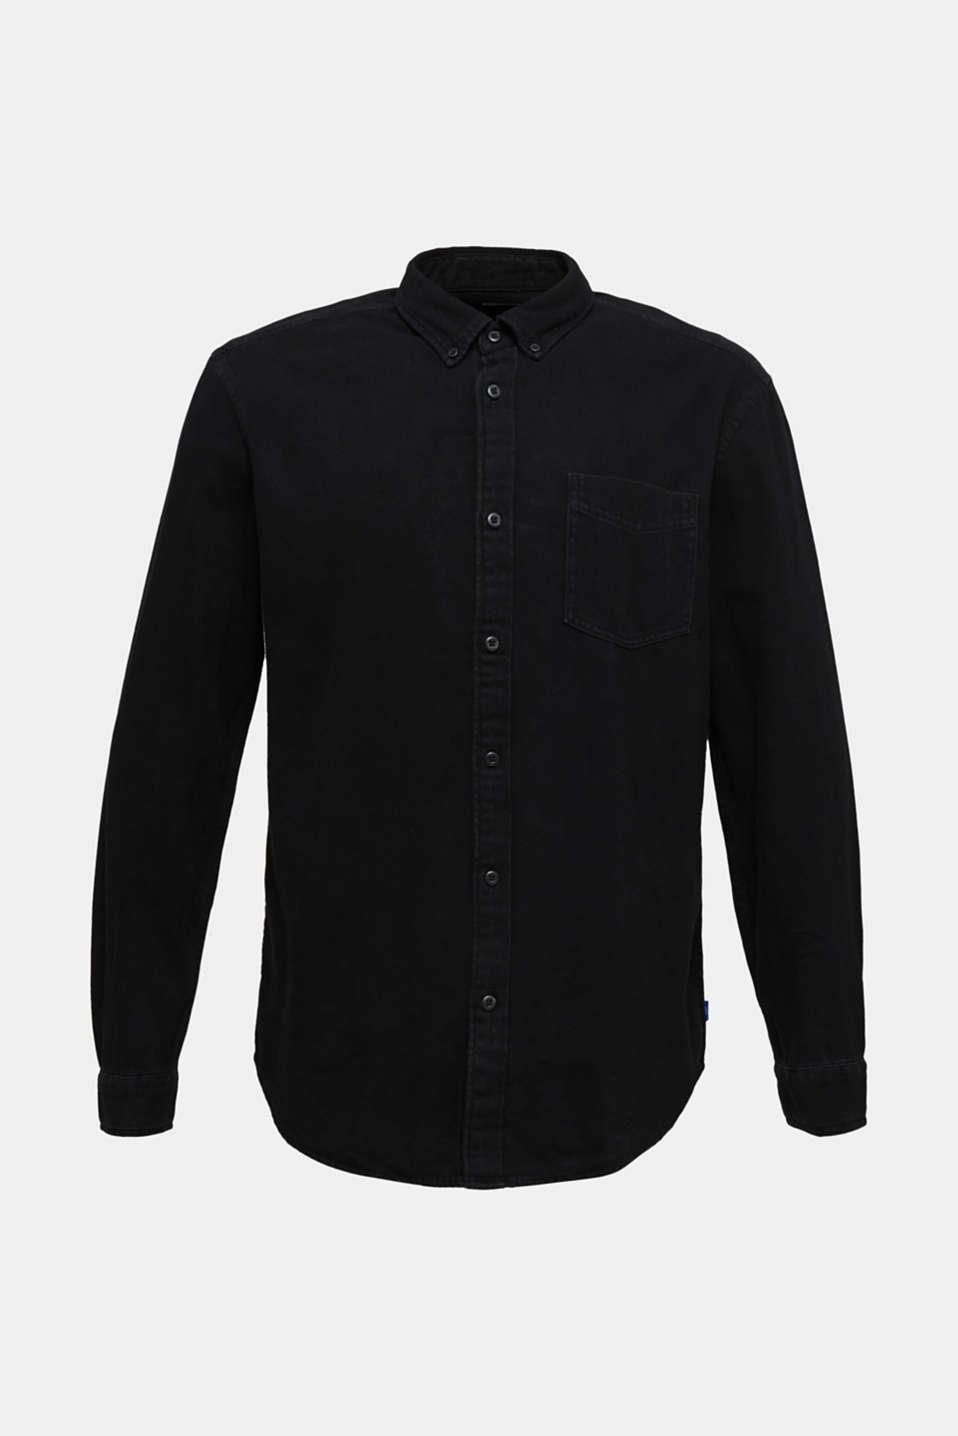 Denim shirt in 100% cotton, BLACK DARK WASH, detail image number 8